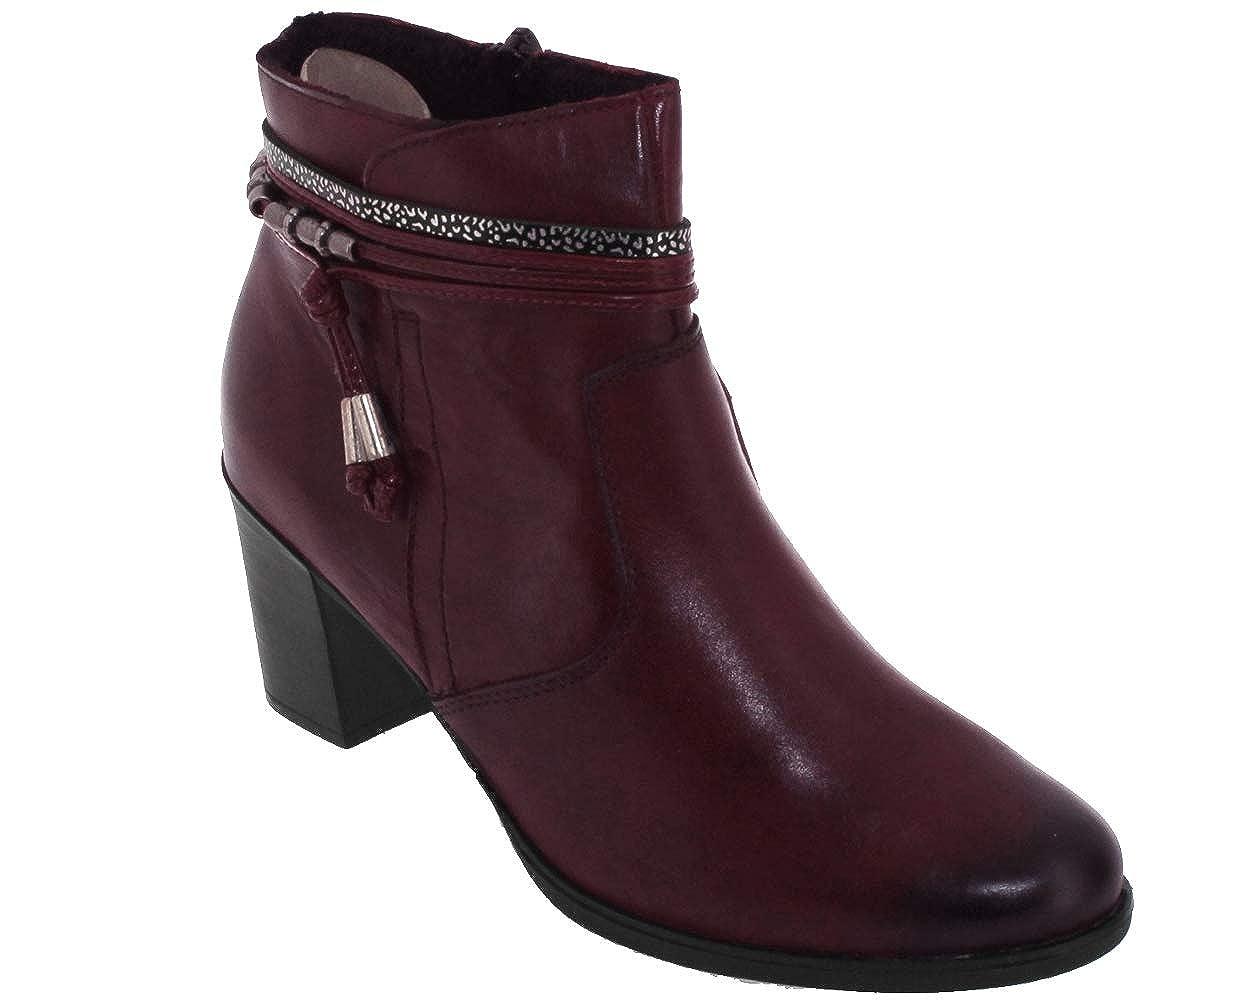 Rieker Damen 59091 Stiefeletten: : Schuhe & Handtaschen